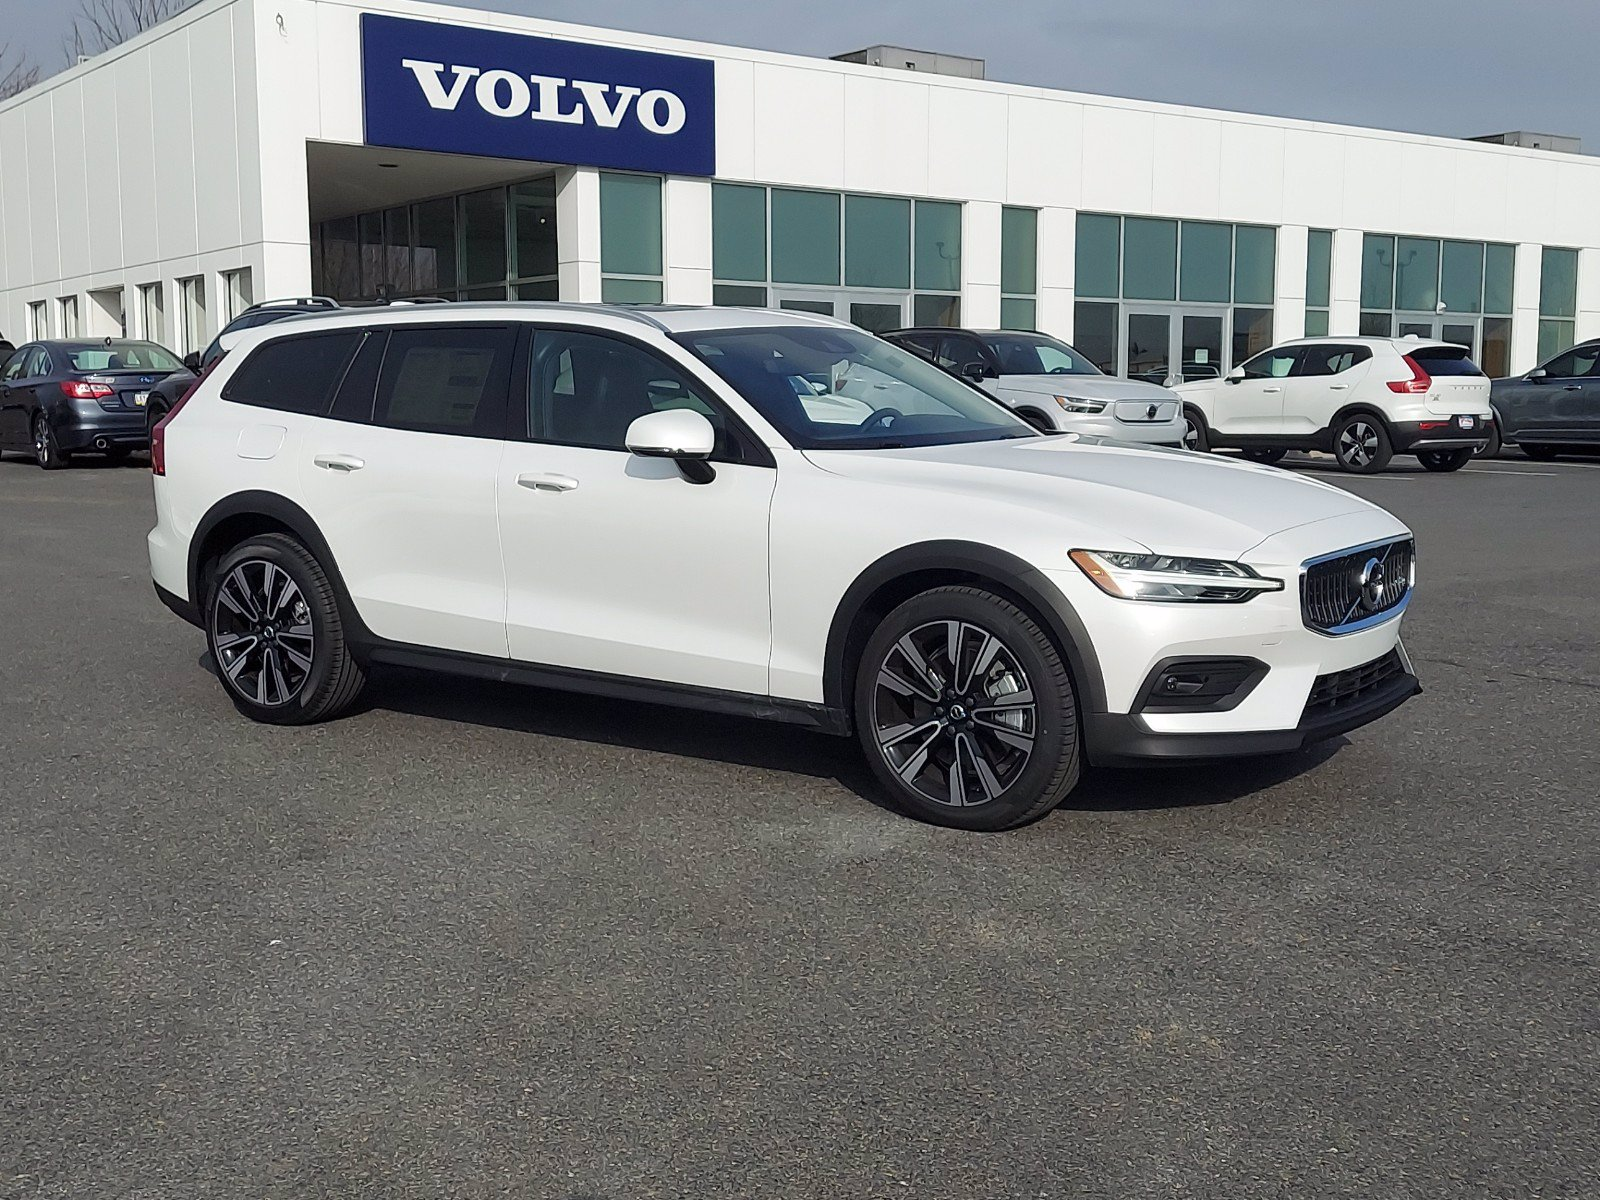 2021 Volvo V60 Cross Country Wagon